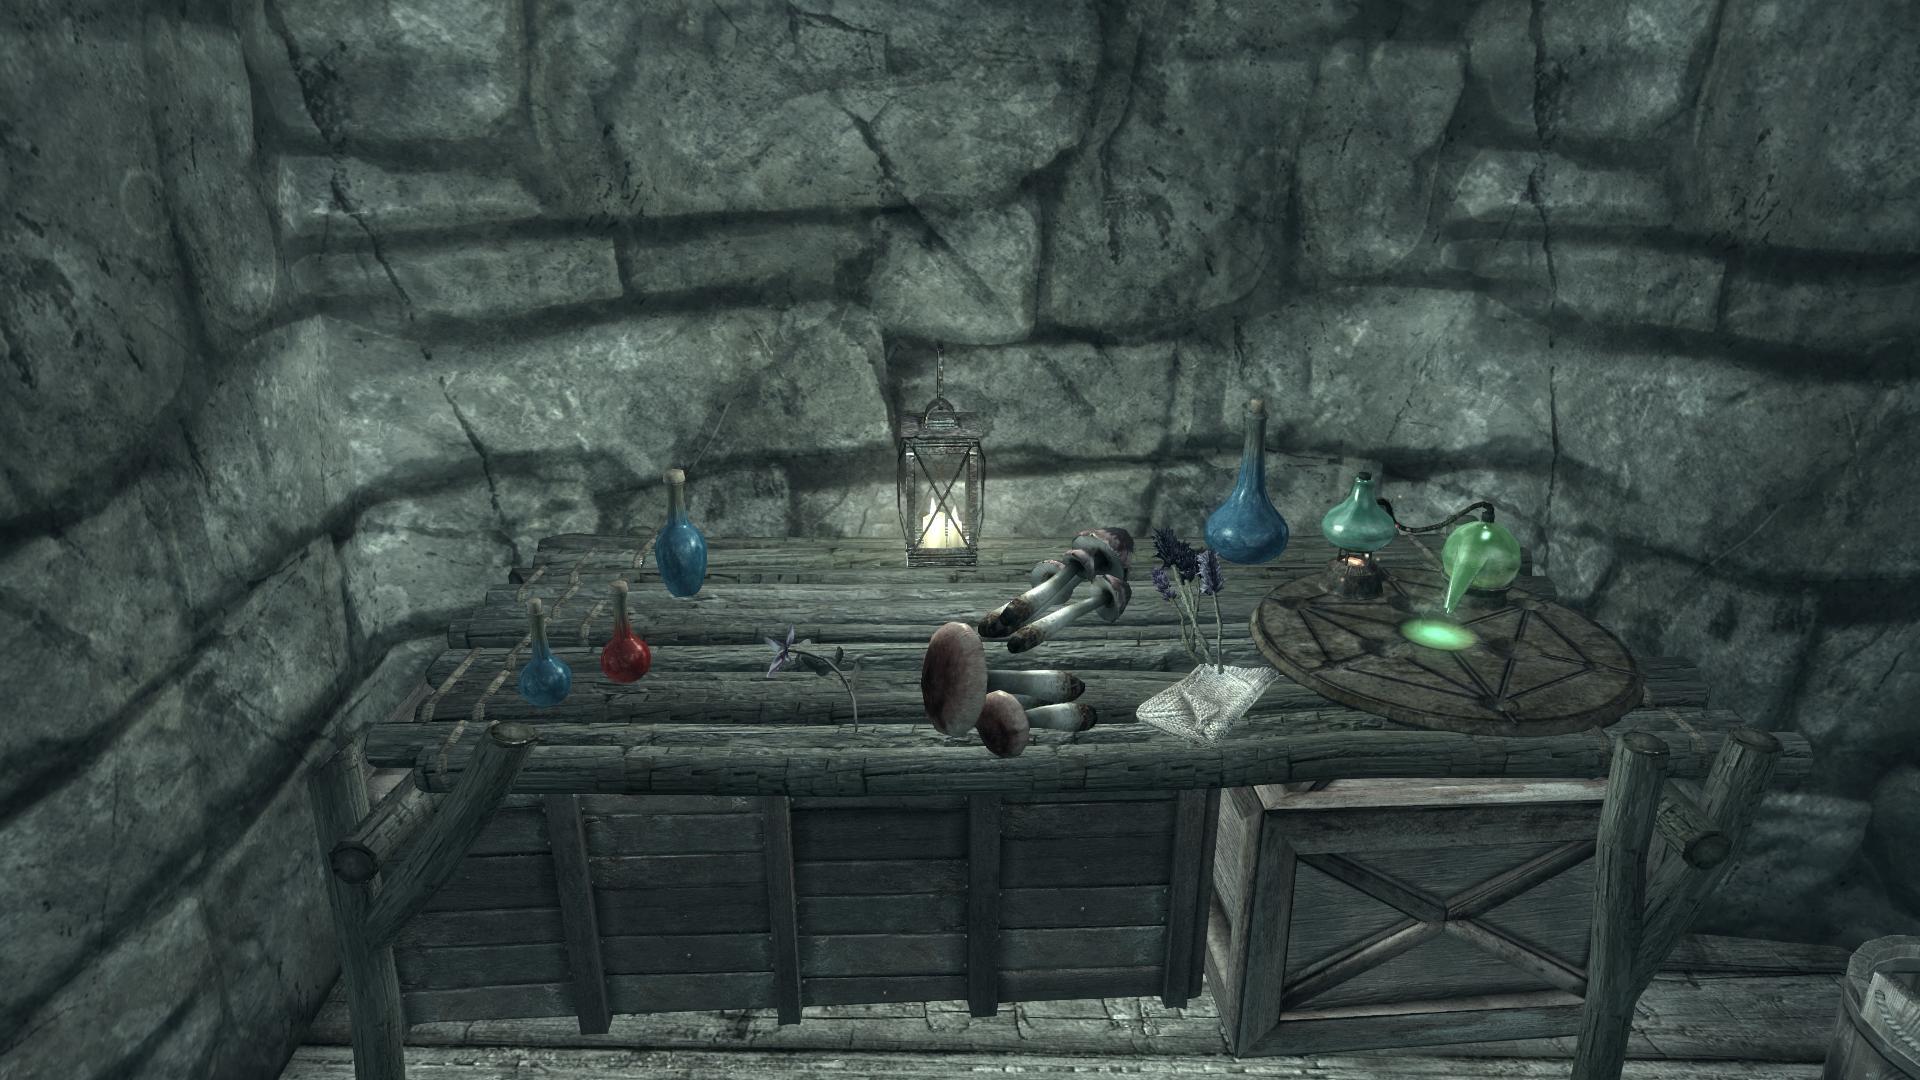 000197.Jpg - Elder Scrolls 5: Skyrim, the